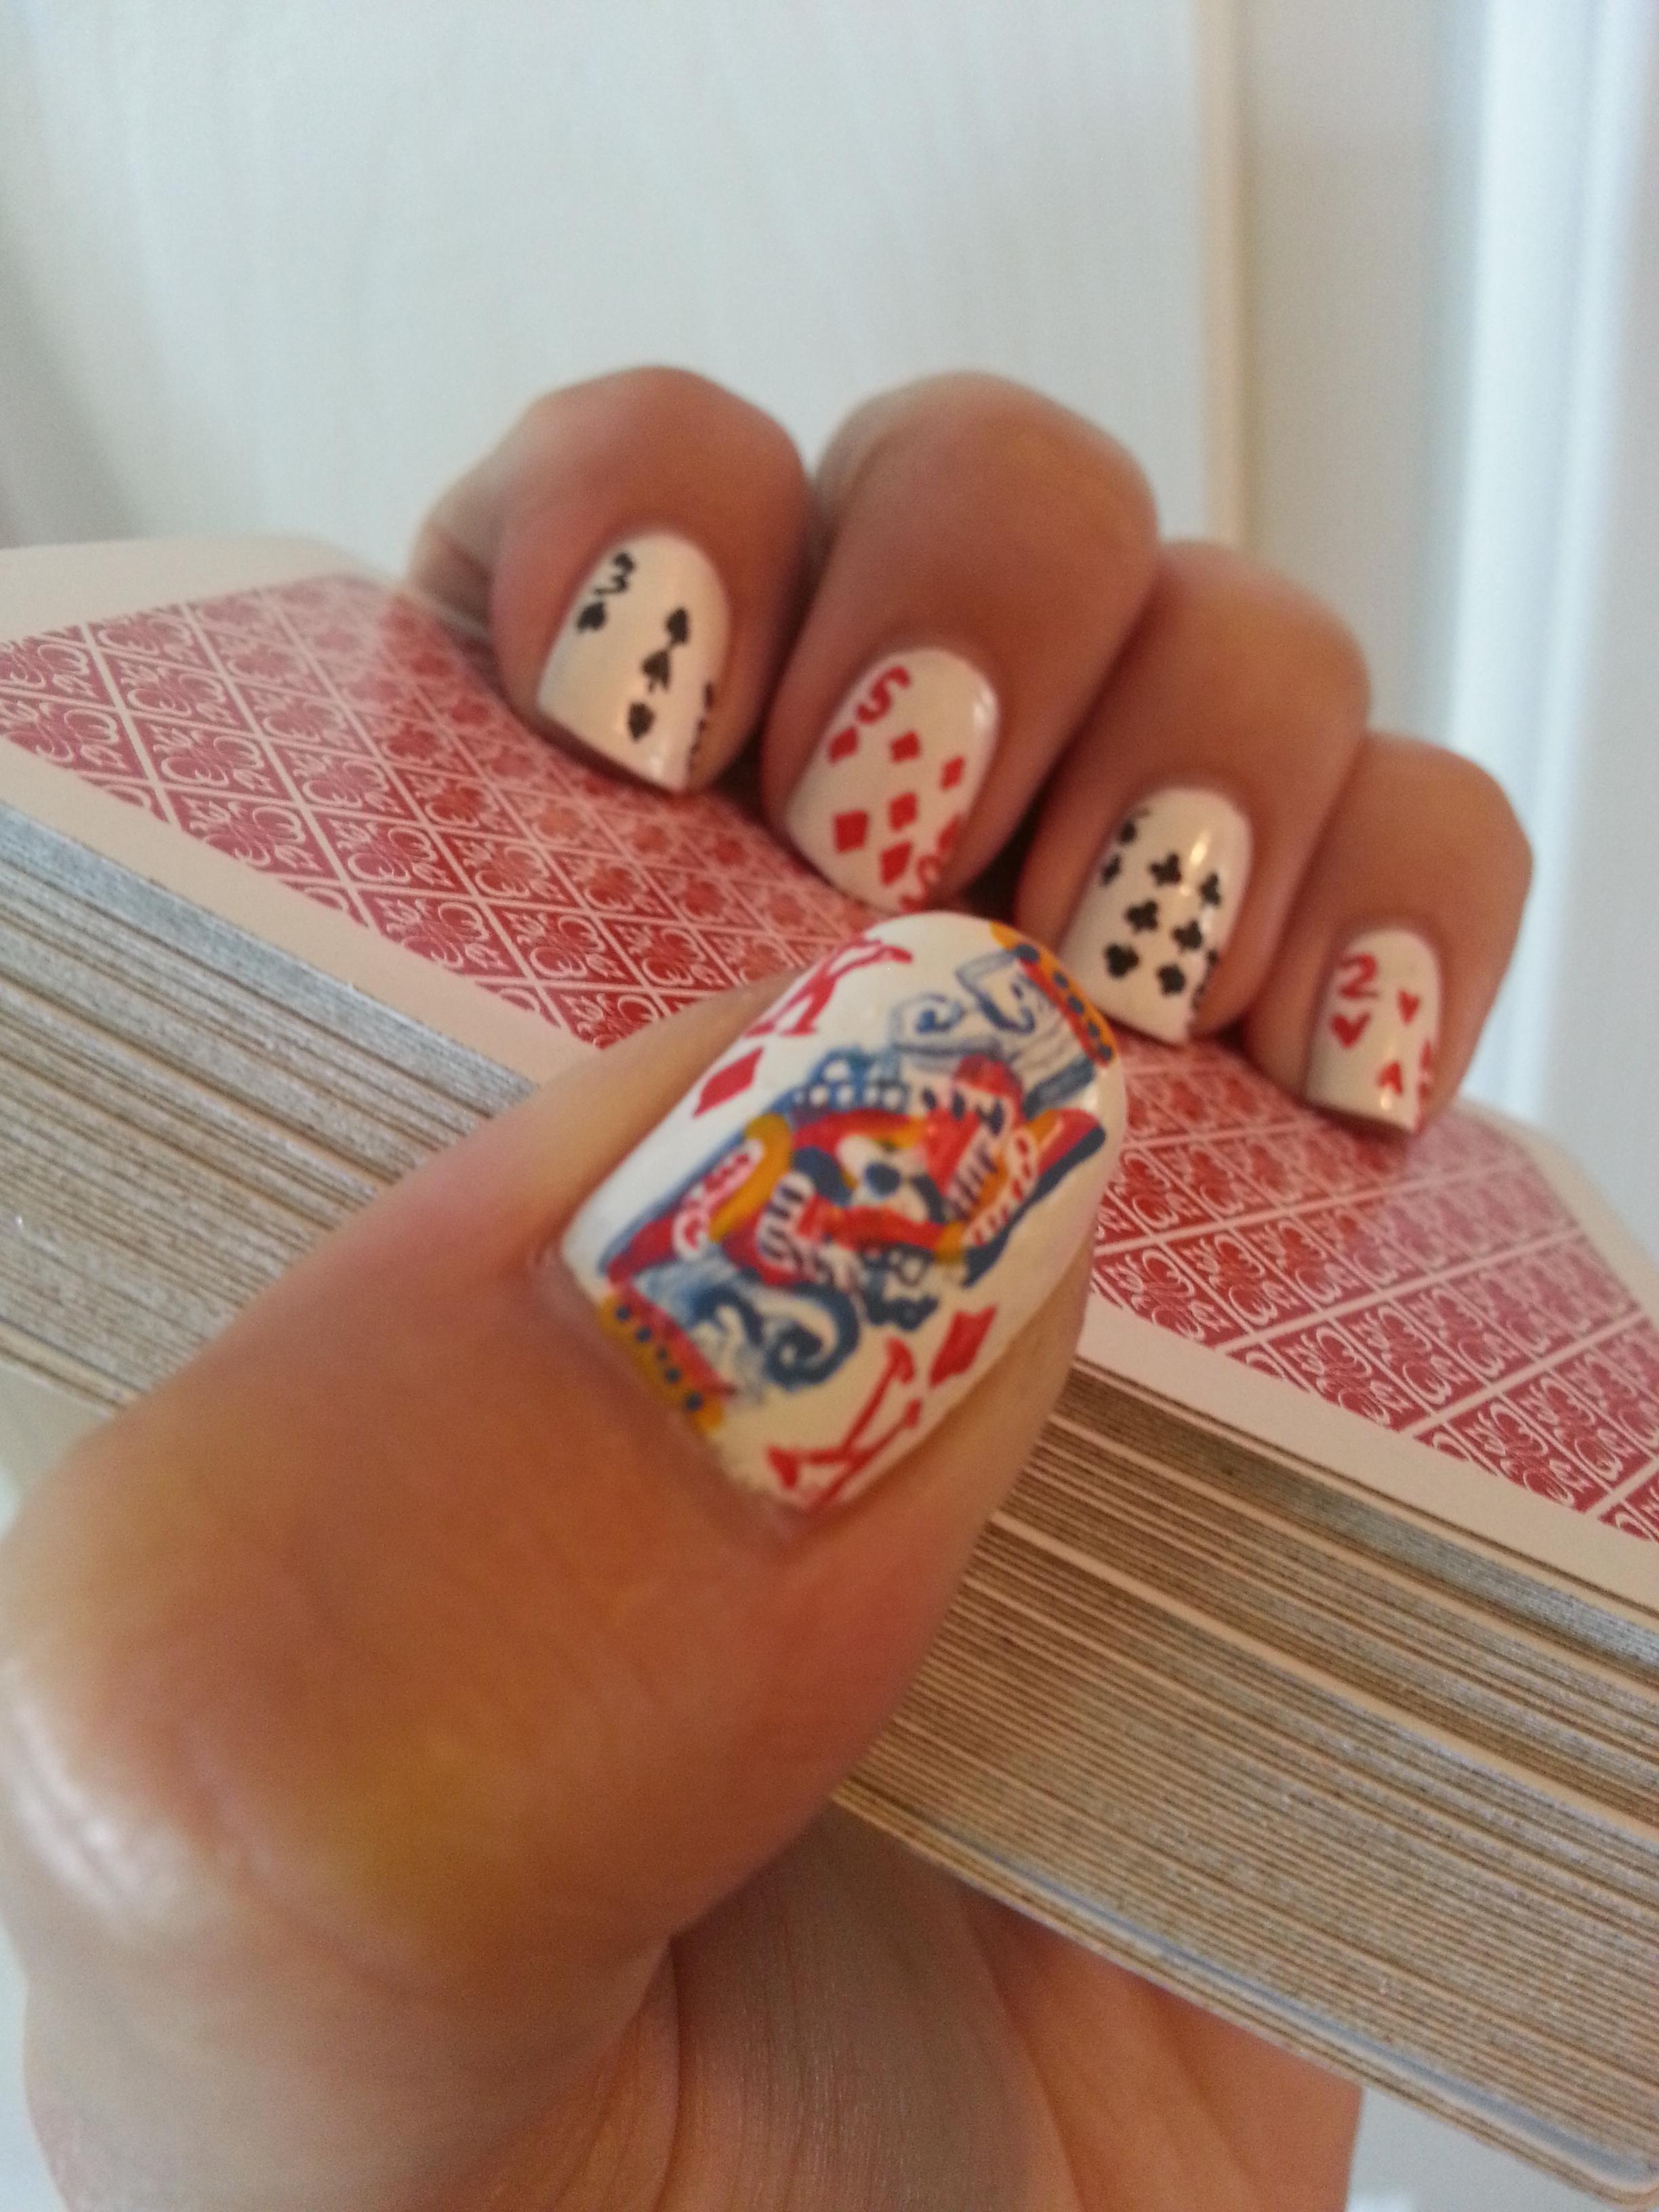 Poker Night Nails | Courtesy of GeekyGasm (Reddit) | Beauty ...